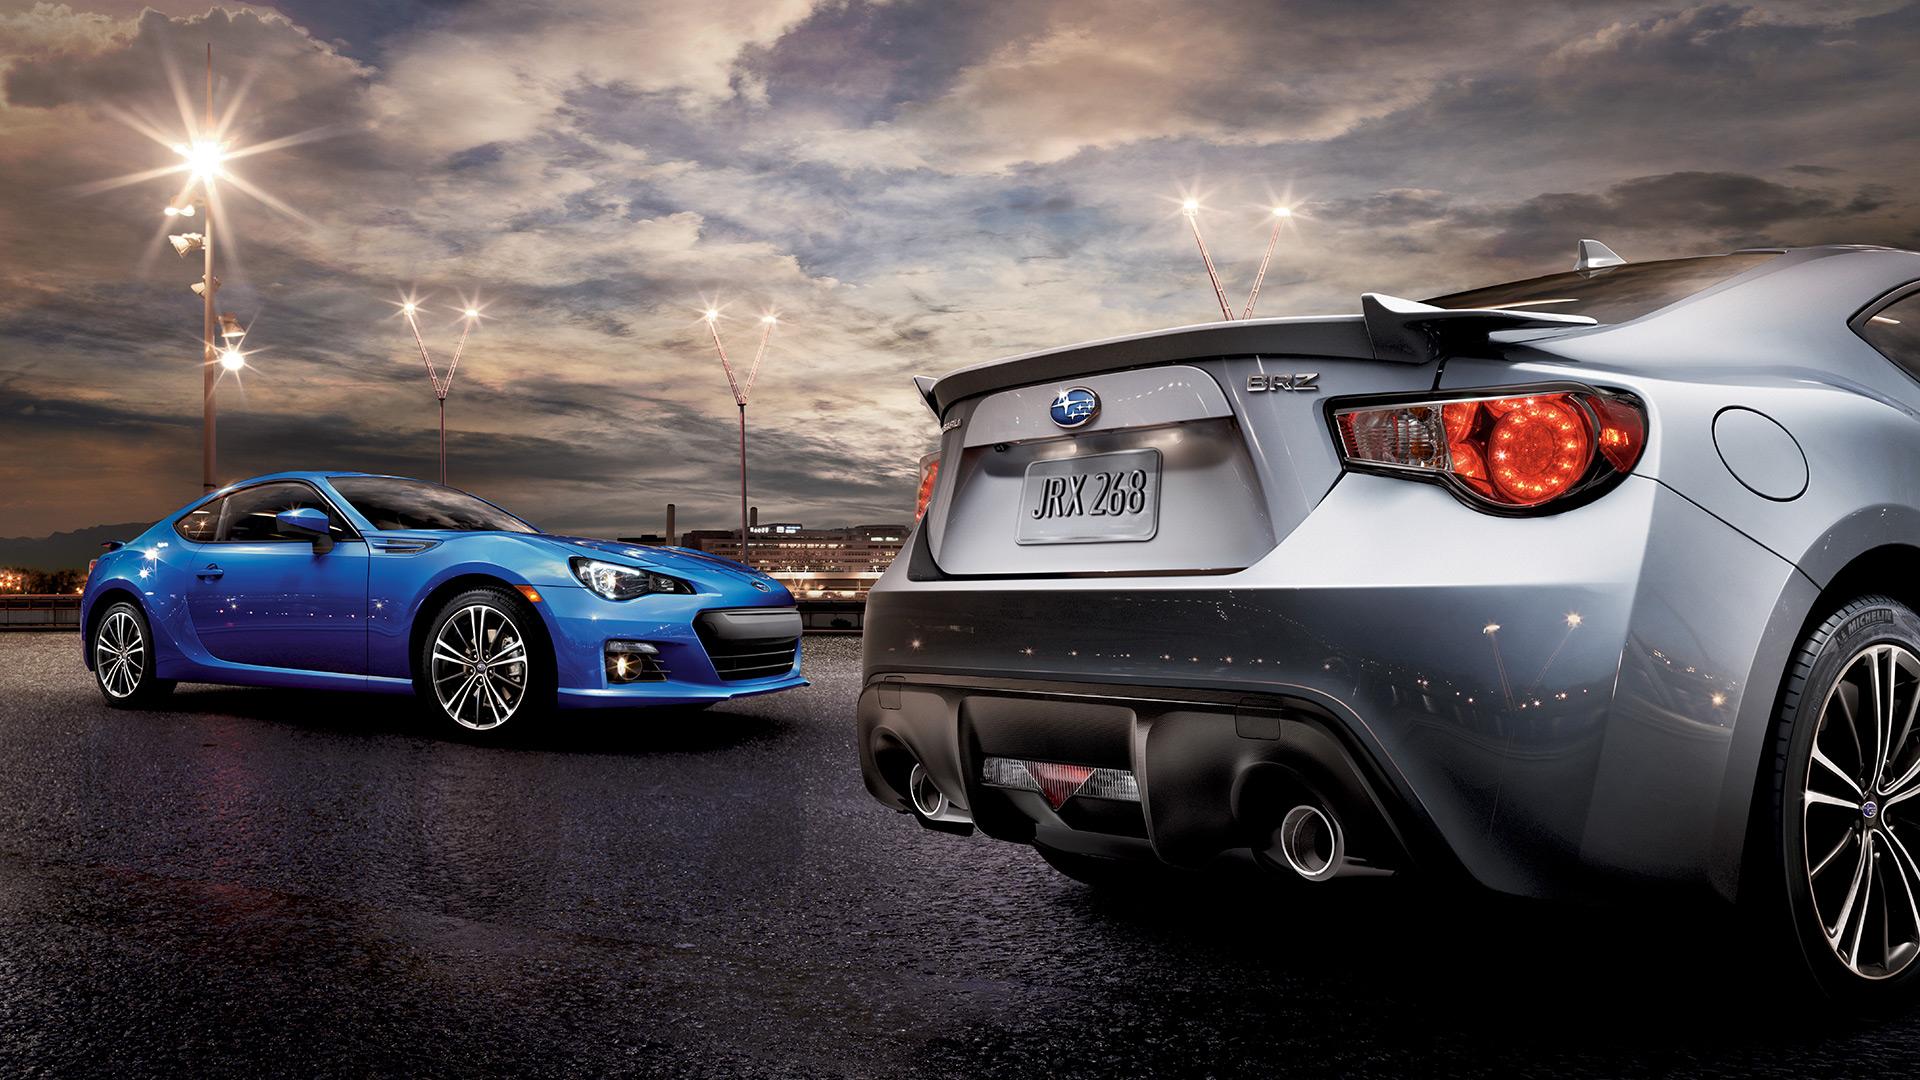 2016 Subaru BRZ | Wallpaper | Side of Road